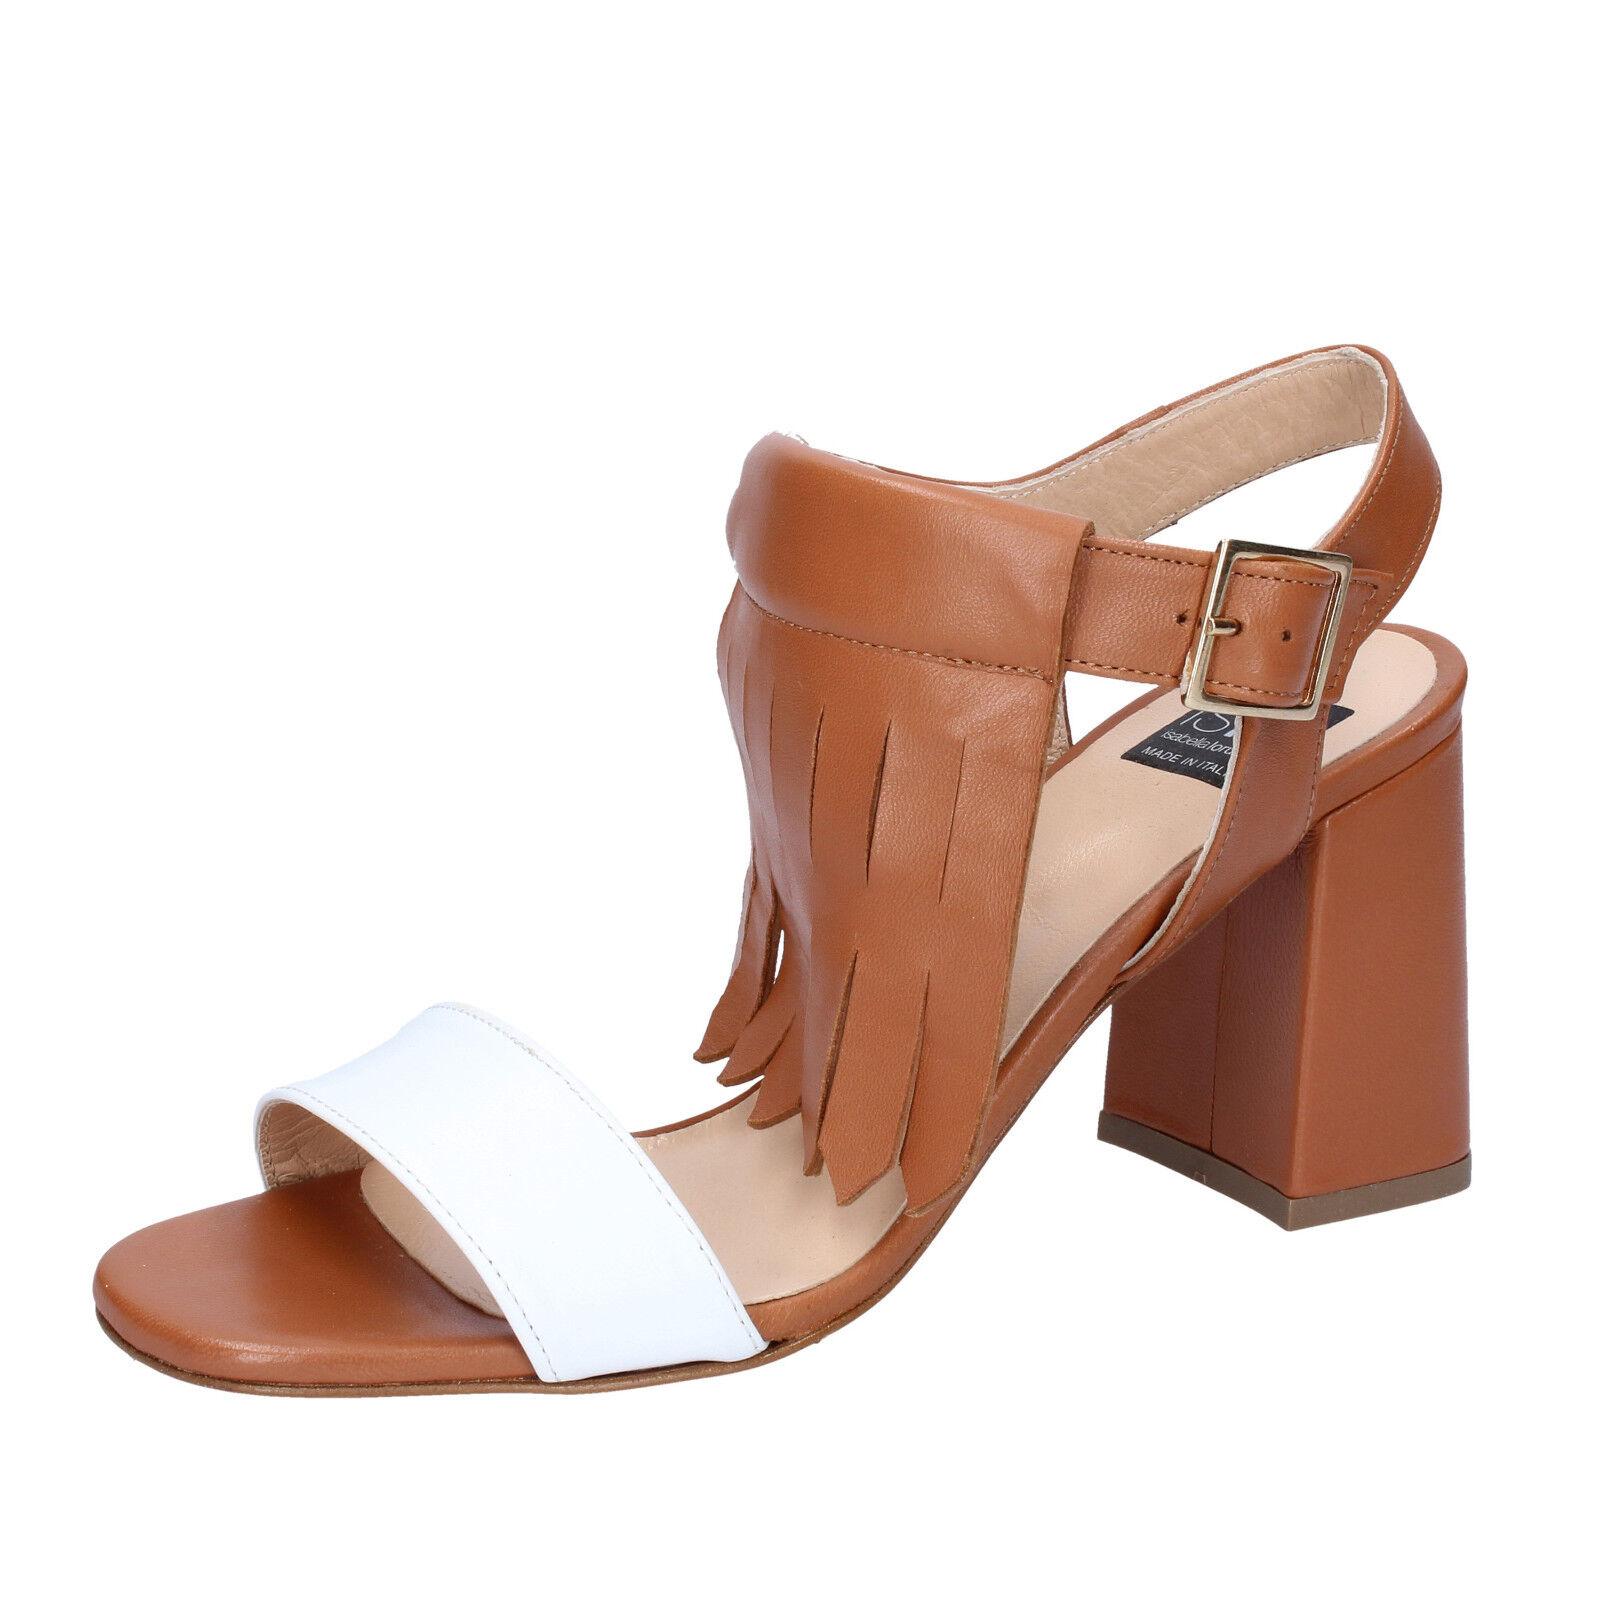 Scarpe donna ISLO ISABELLA LORUSSO 39 EU sandali marrone bianco pelle BZ332-D